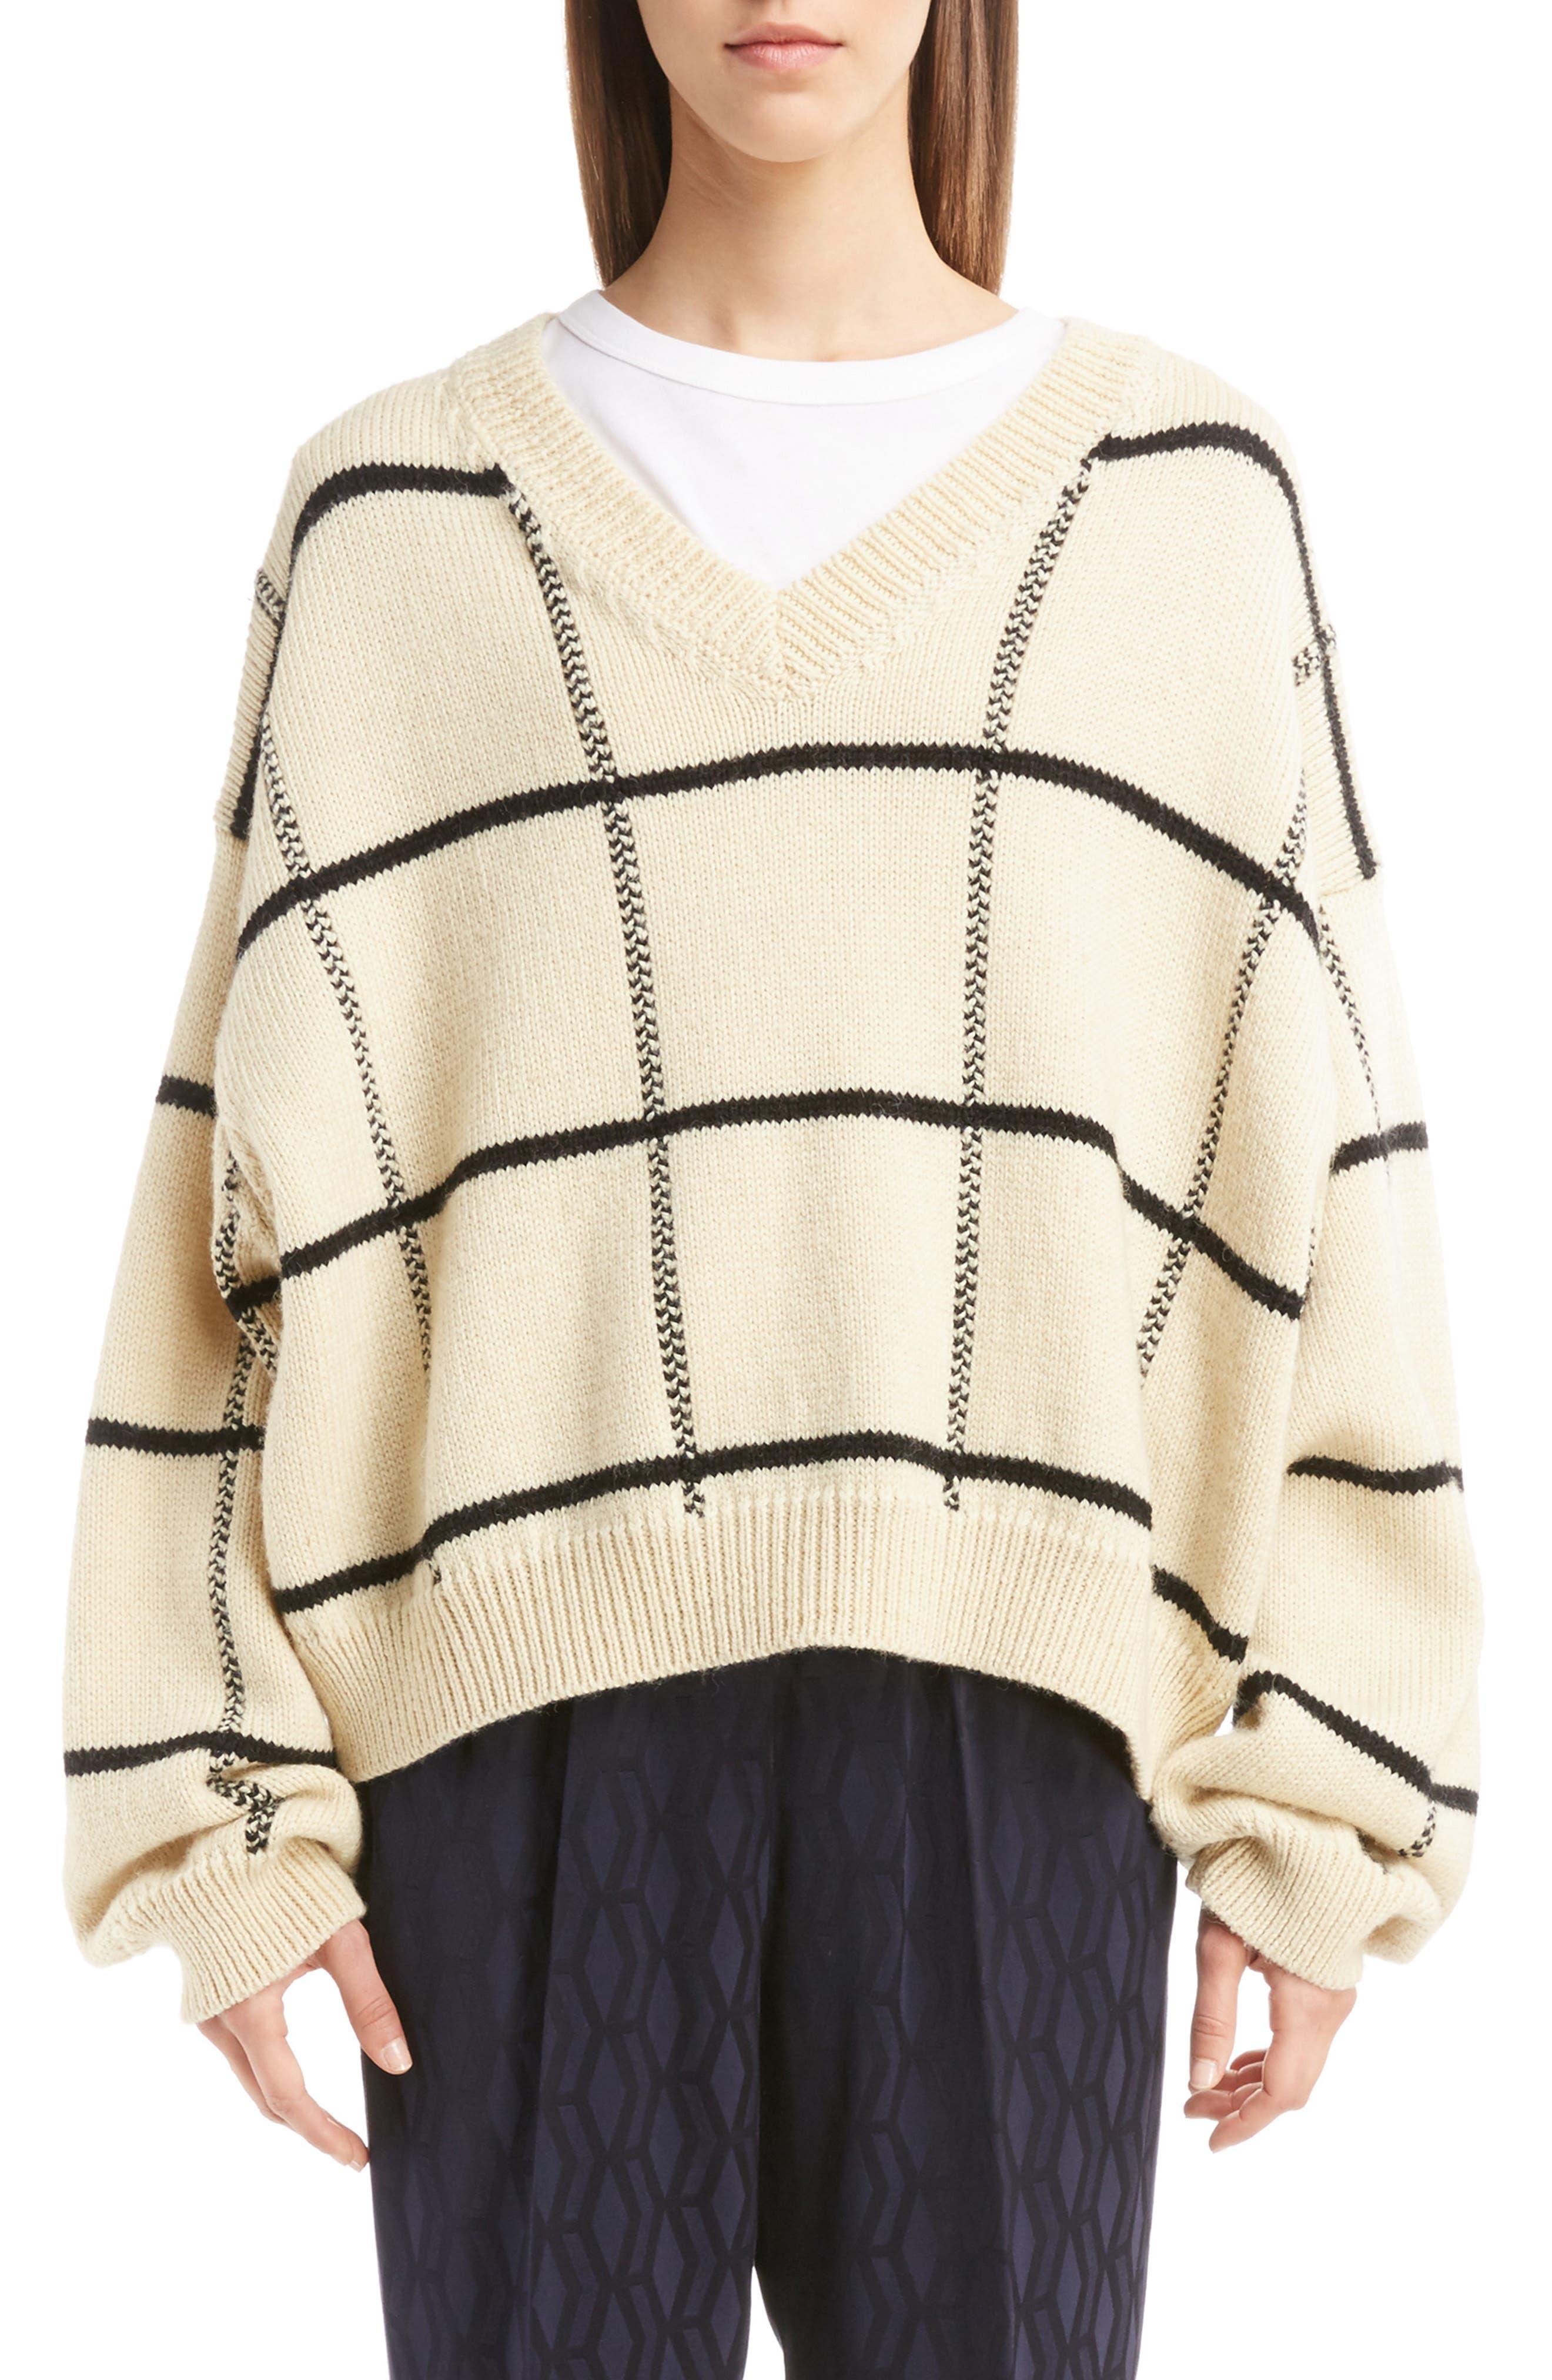 Dries Van Noten Windowpane Knit Wool Sweater